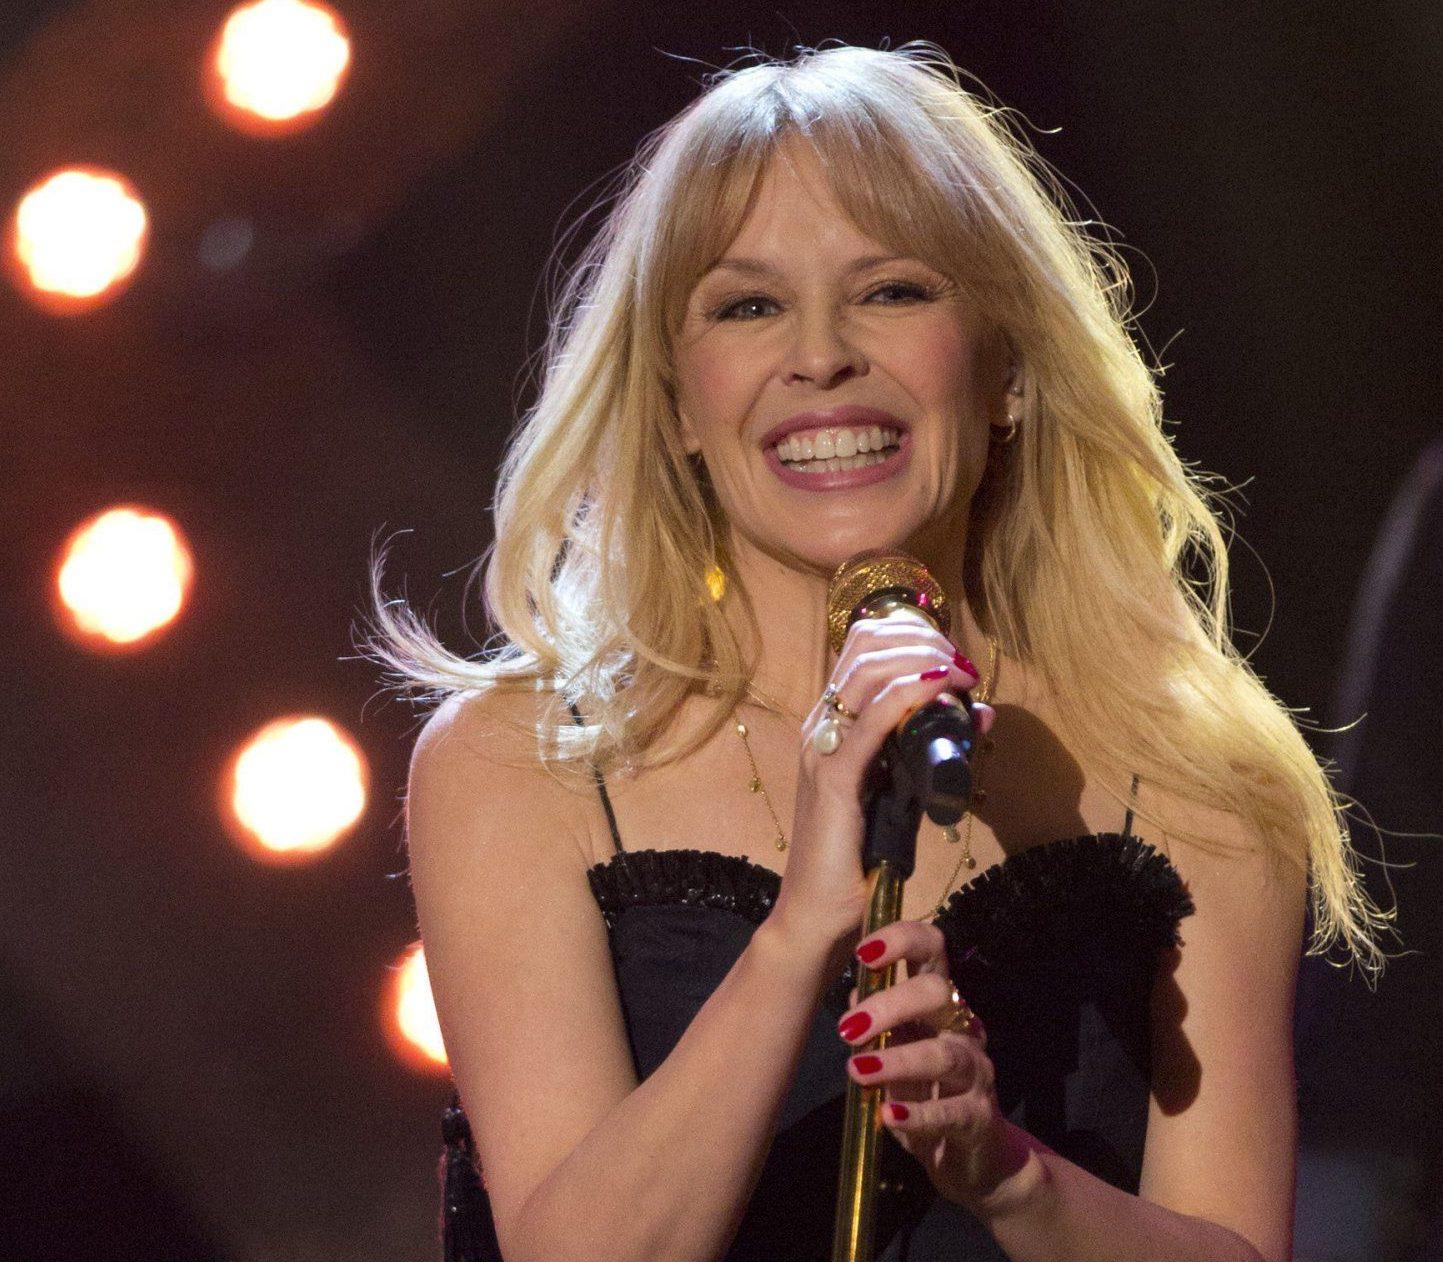 Kylie Minogue 'confirmed' for Glastonbury 2019's Legends slot